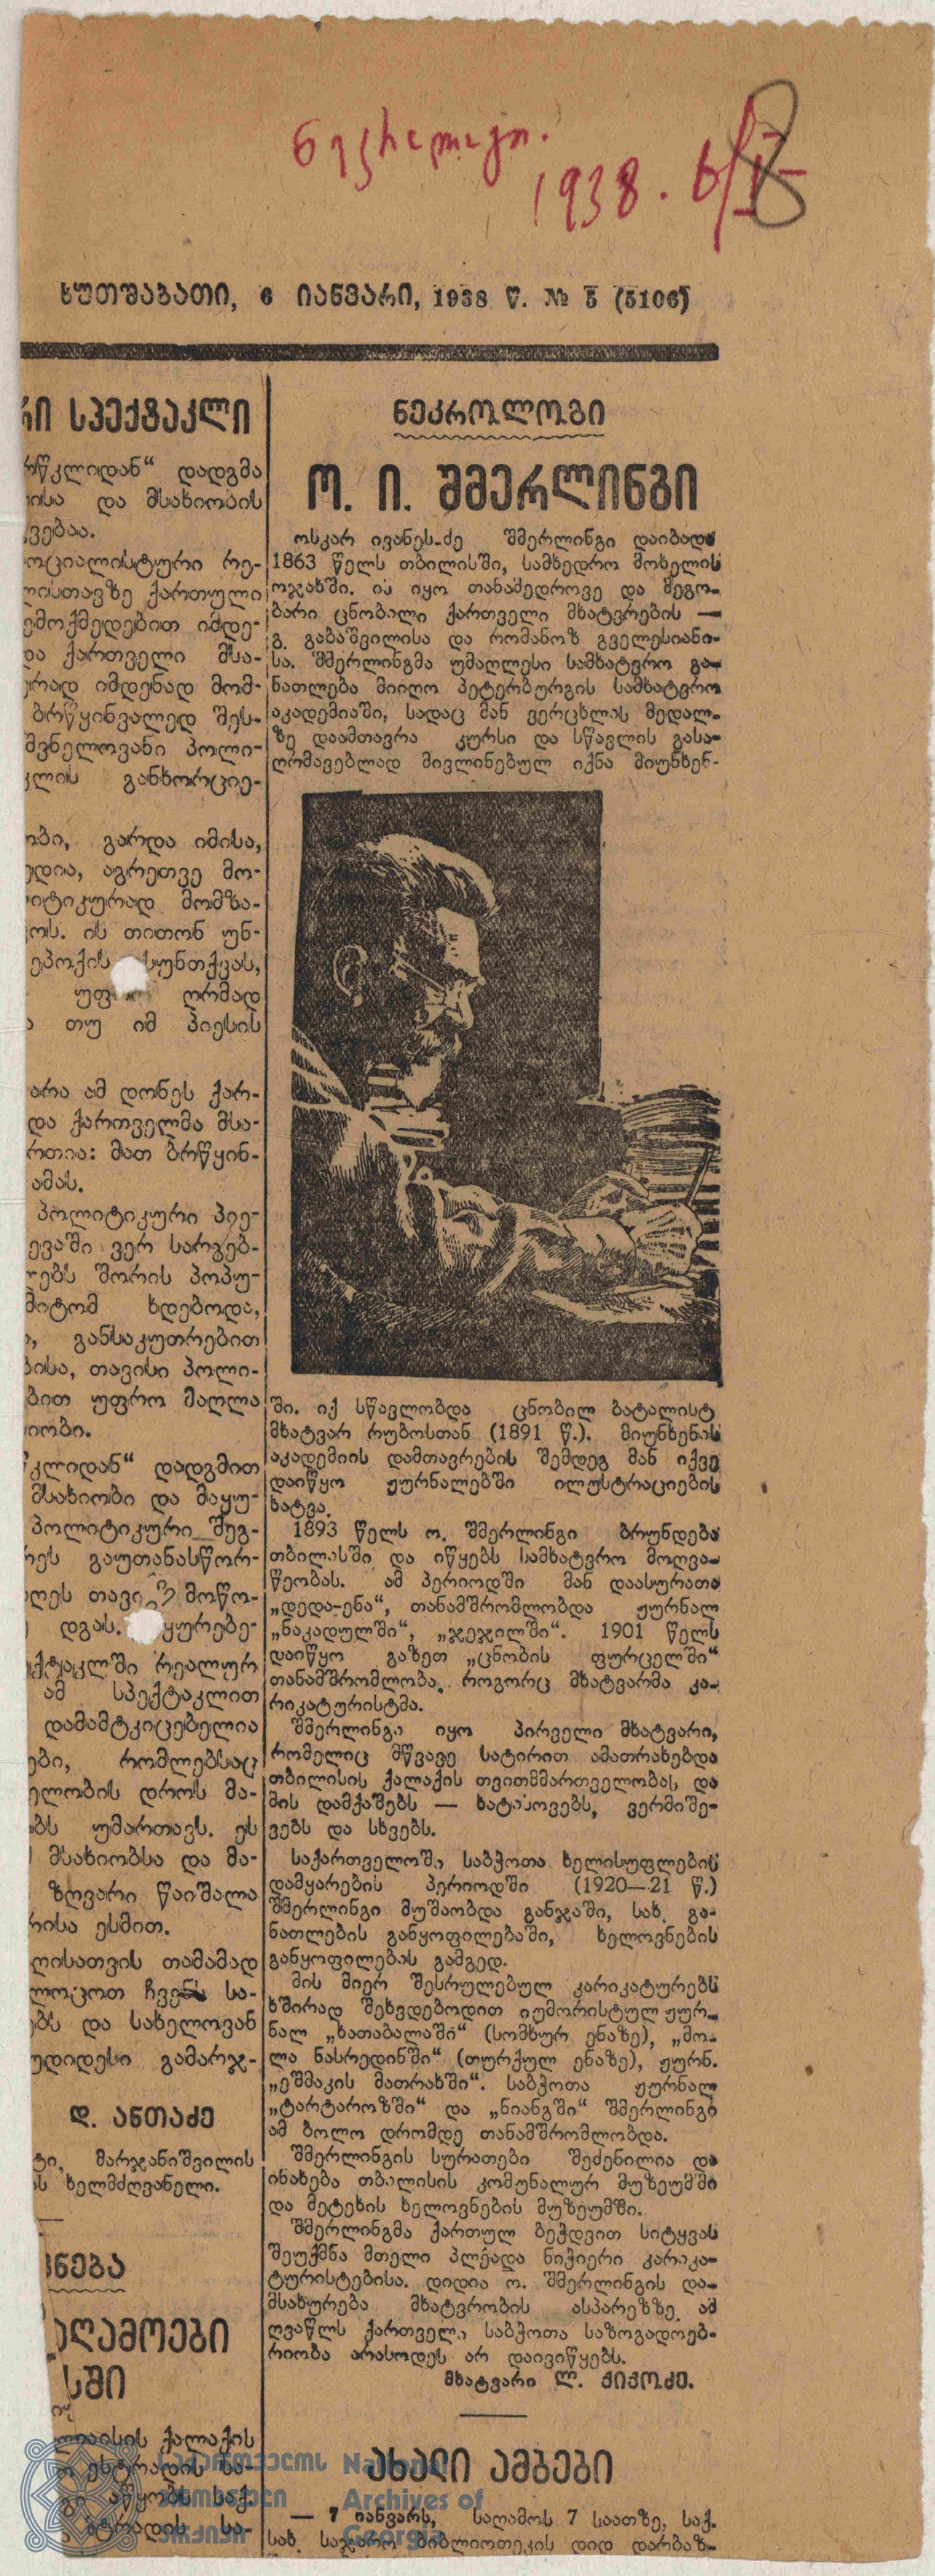 Schmerling Obituary #1